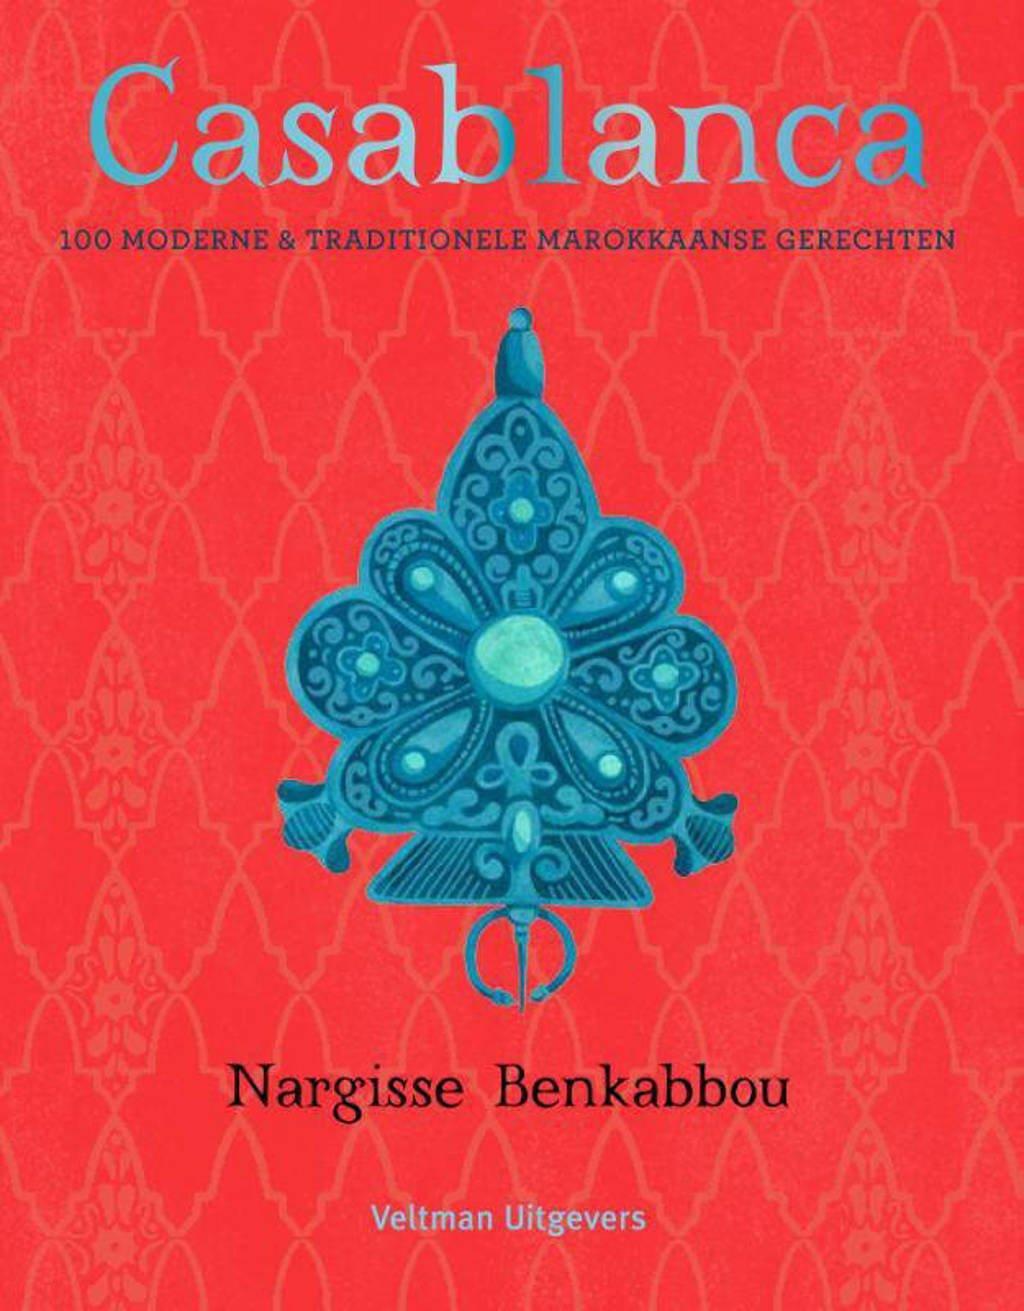 Casablanca - Nargisse Benkabbou